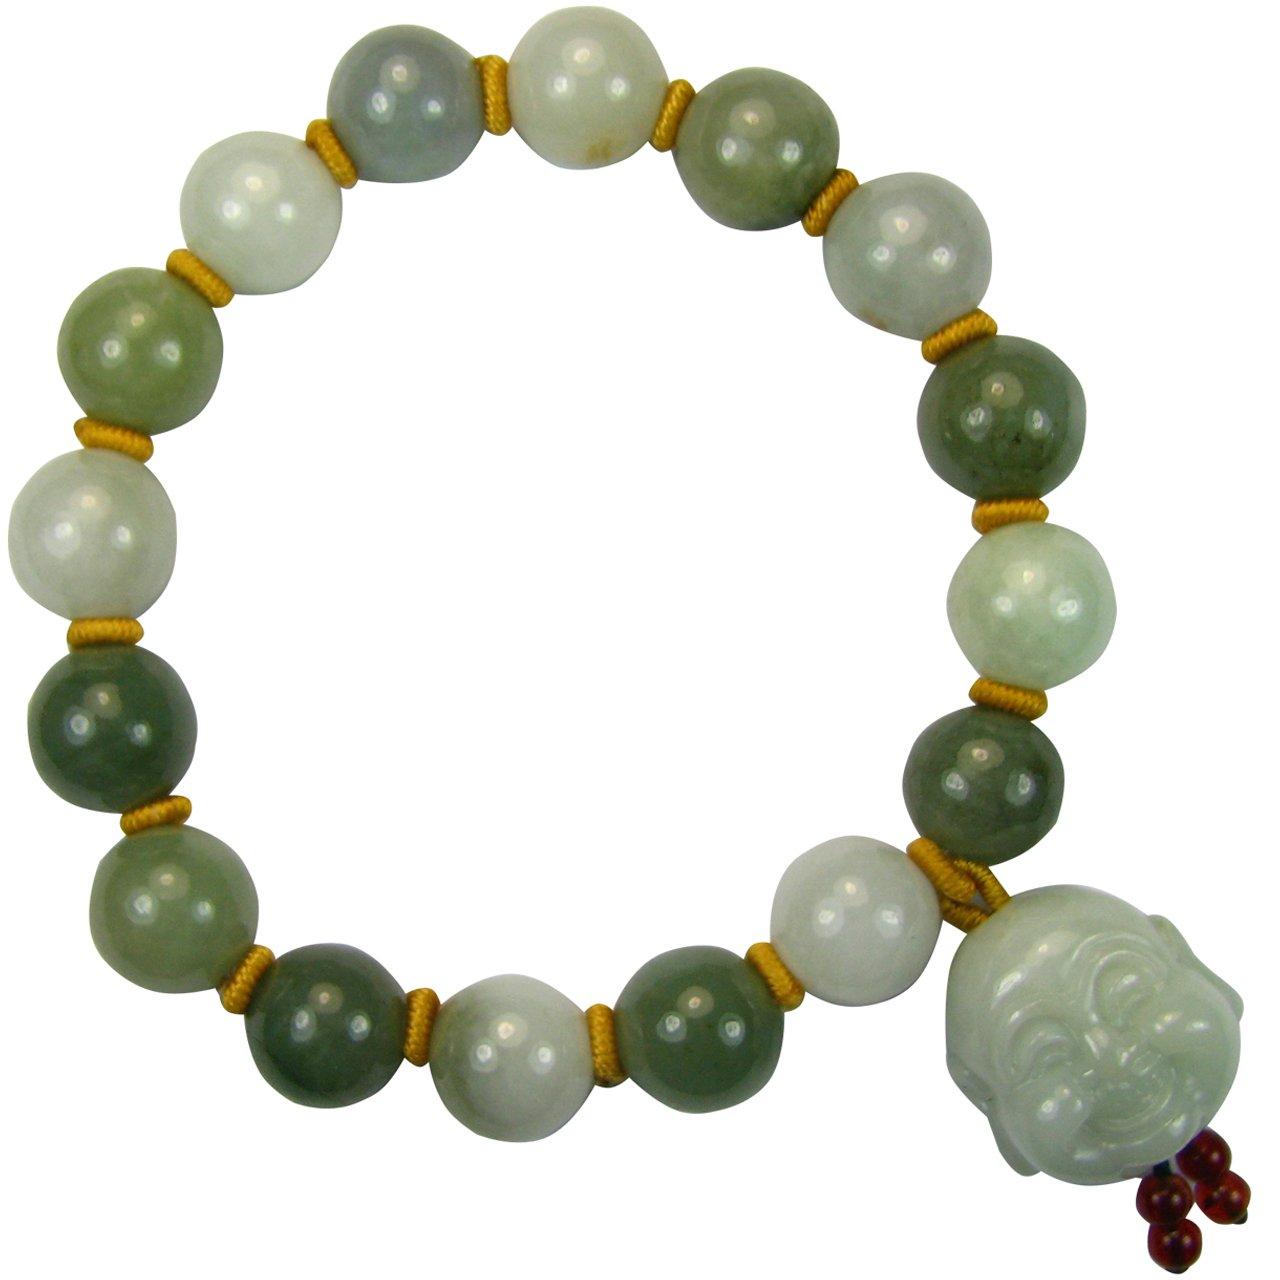 Dahlia Laughing Buddha Jade Bead Bracelet Genuine Certified Grade A Jadeite, 8''